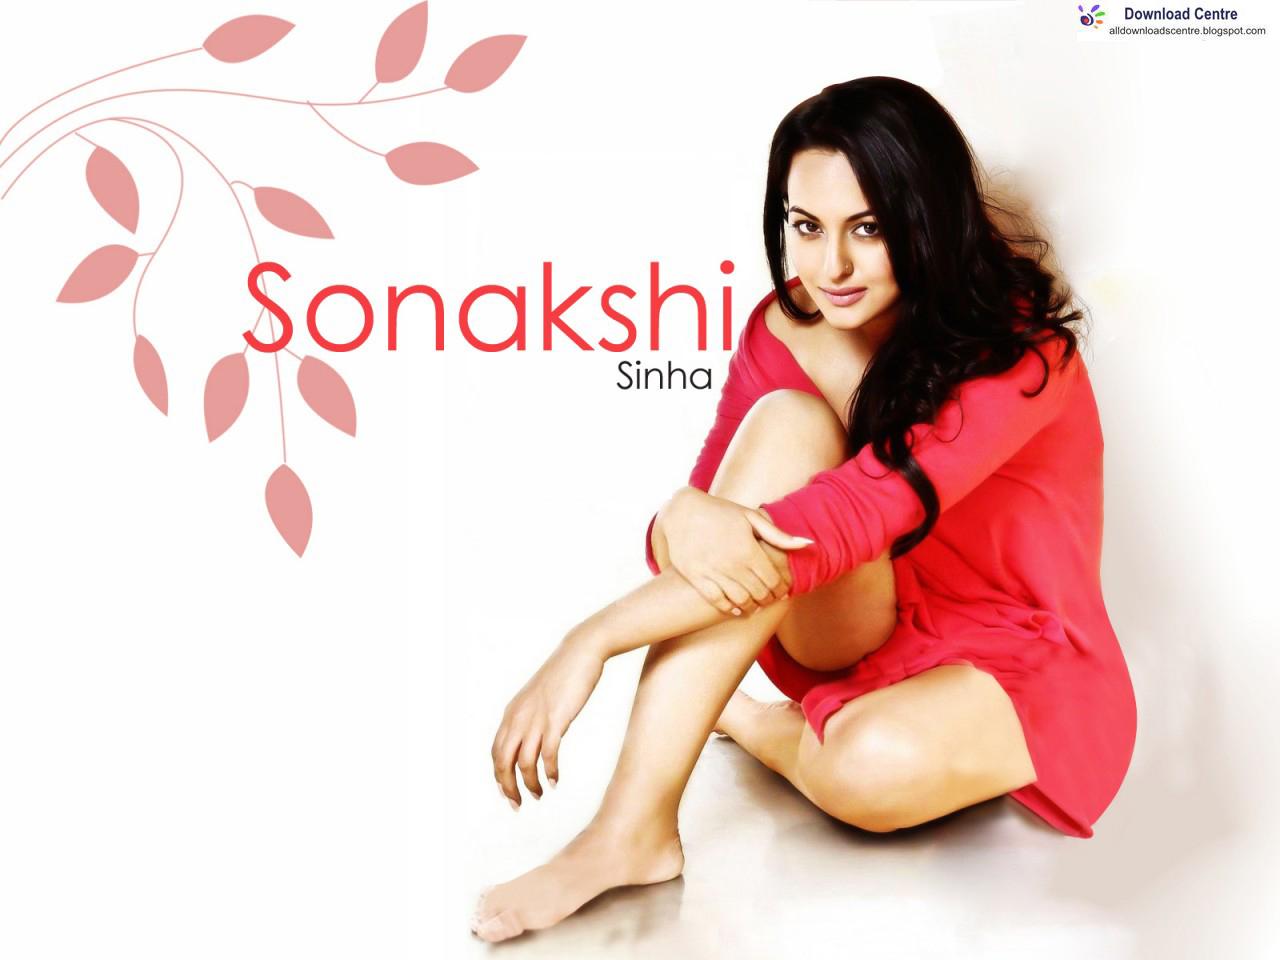 http://2.bp.blogspot.com/-izaYgHkKabo/TvsEo6hYoGI/AAAAAAAACck/T-WBG2gHH7Y/s1600/Sonakshi+Sinha+in+Red+Dress+Wallpaper.jpg